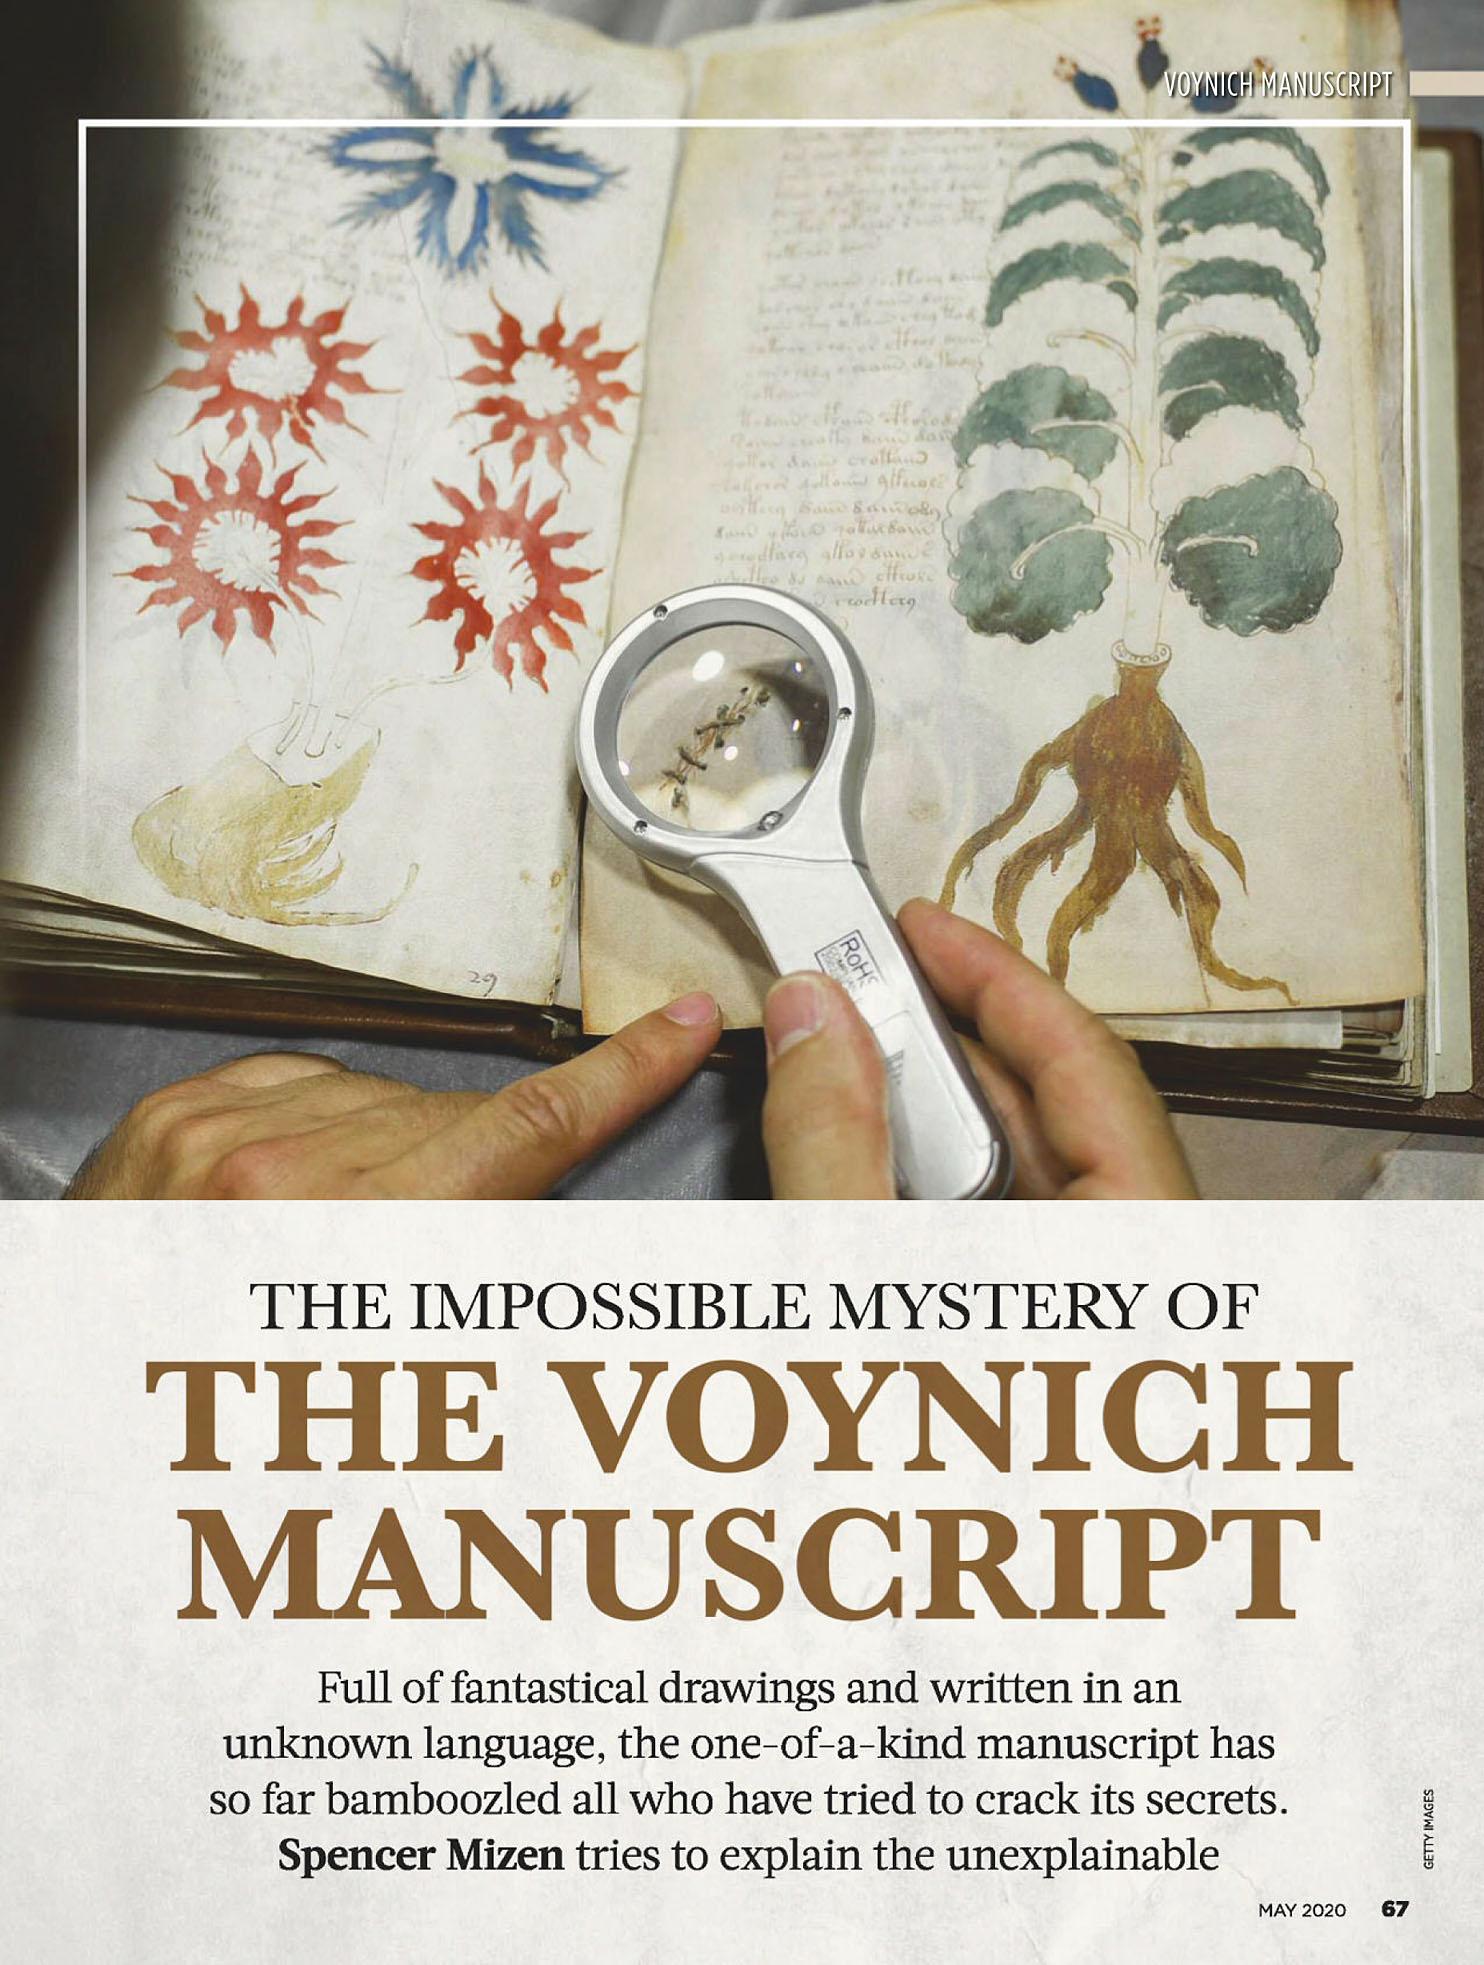 History Revealed 2020-05 Voynich Manuscript-1.jpg